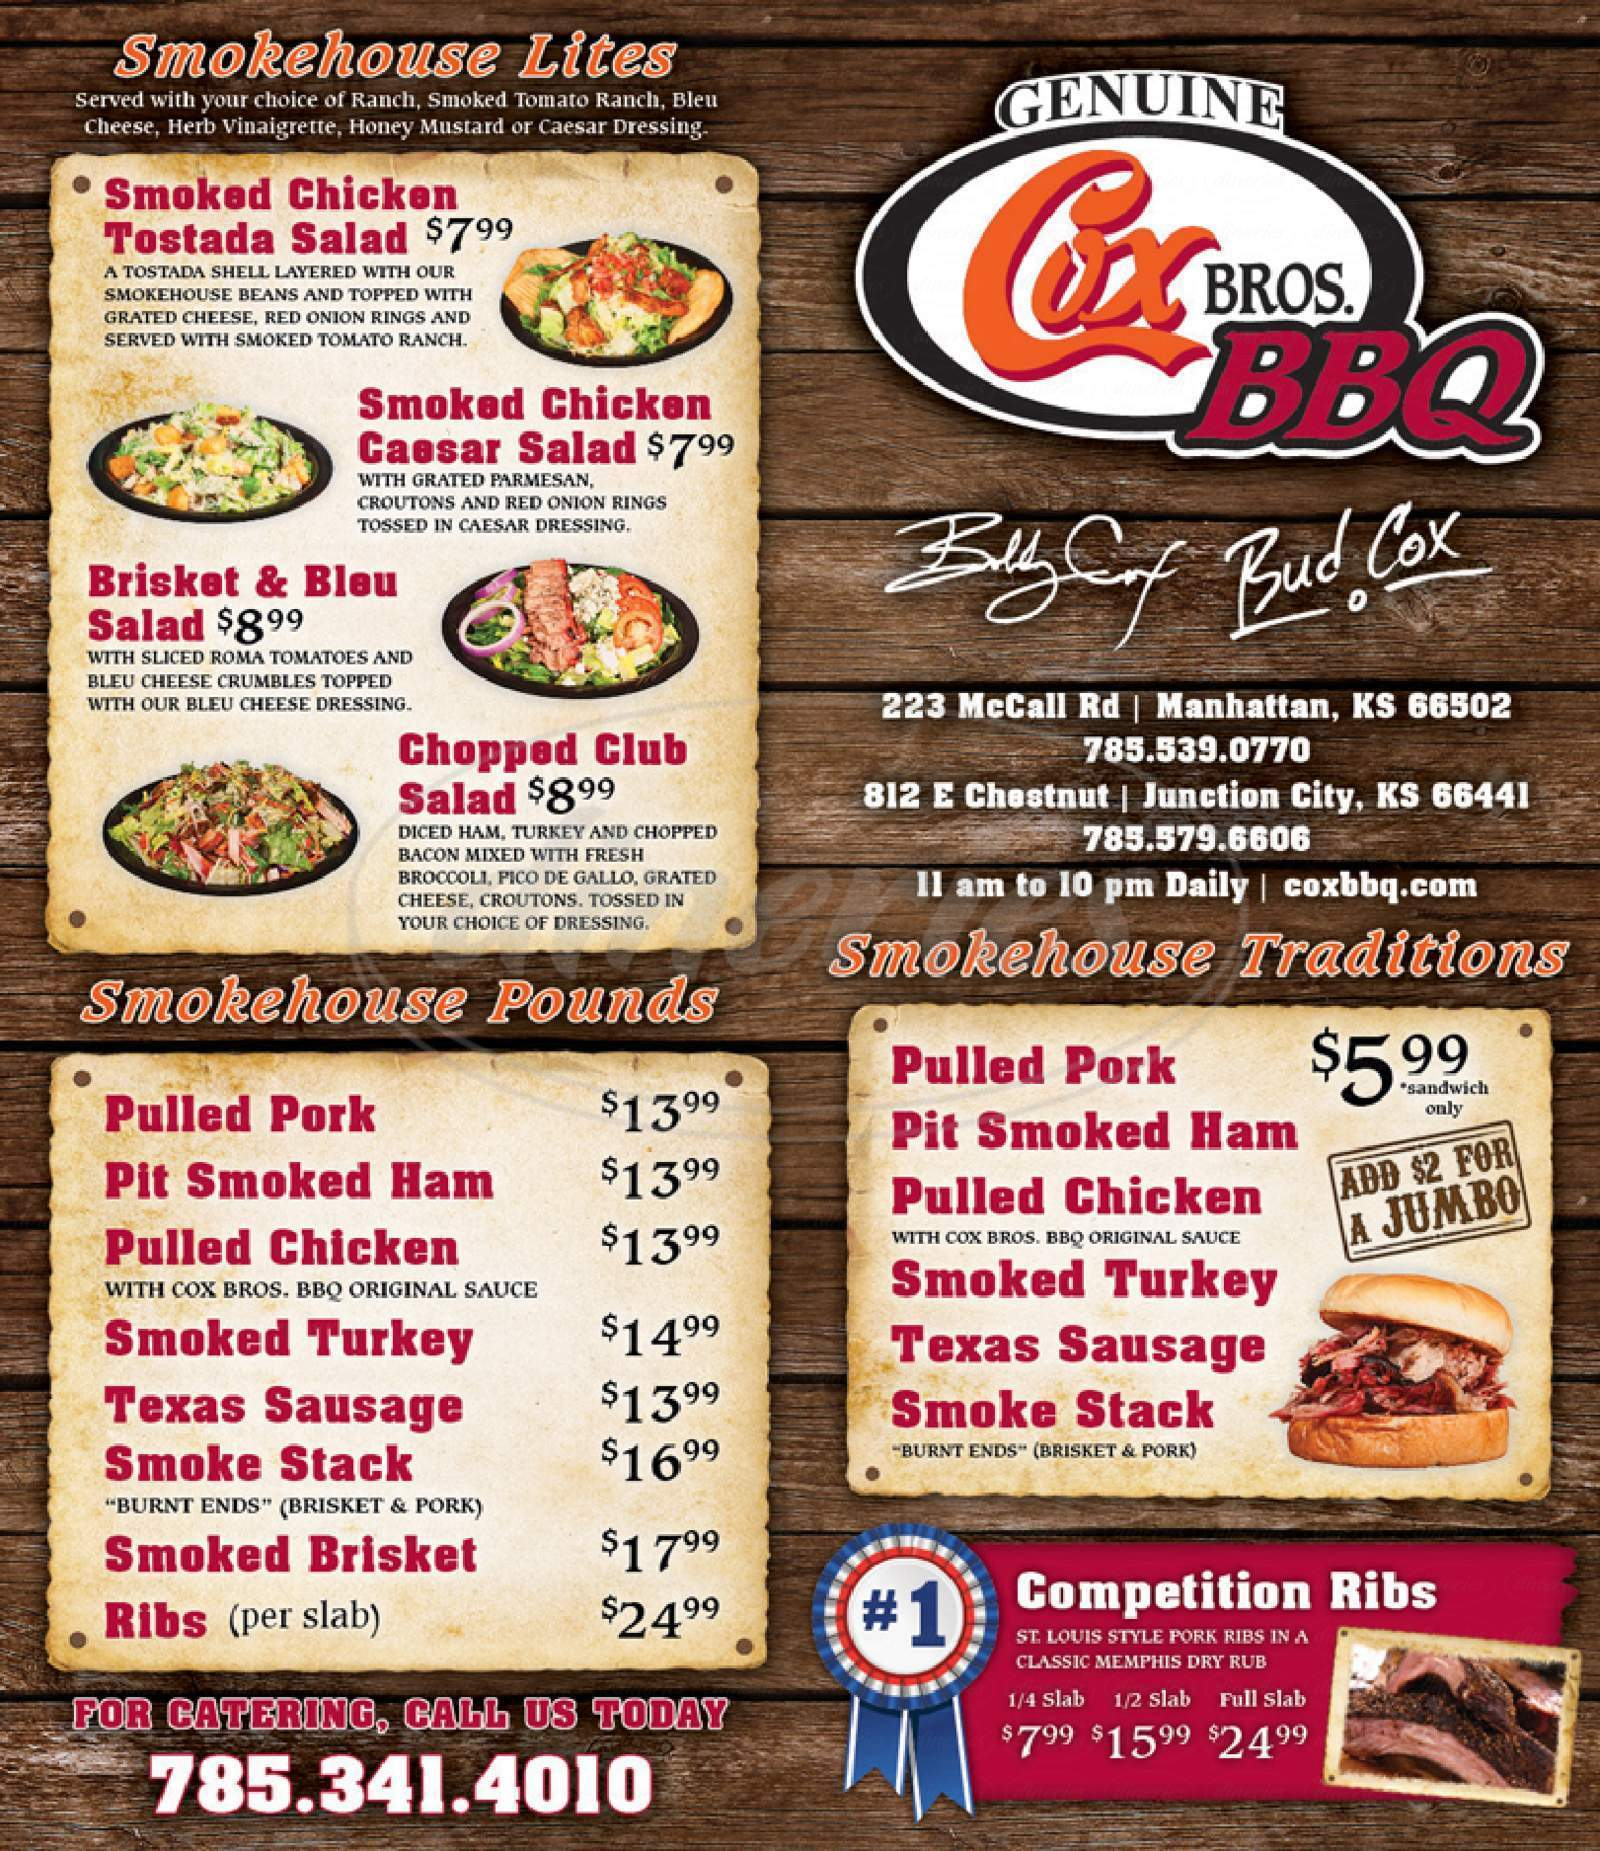 menu for Cox Bros Bbq